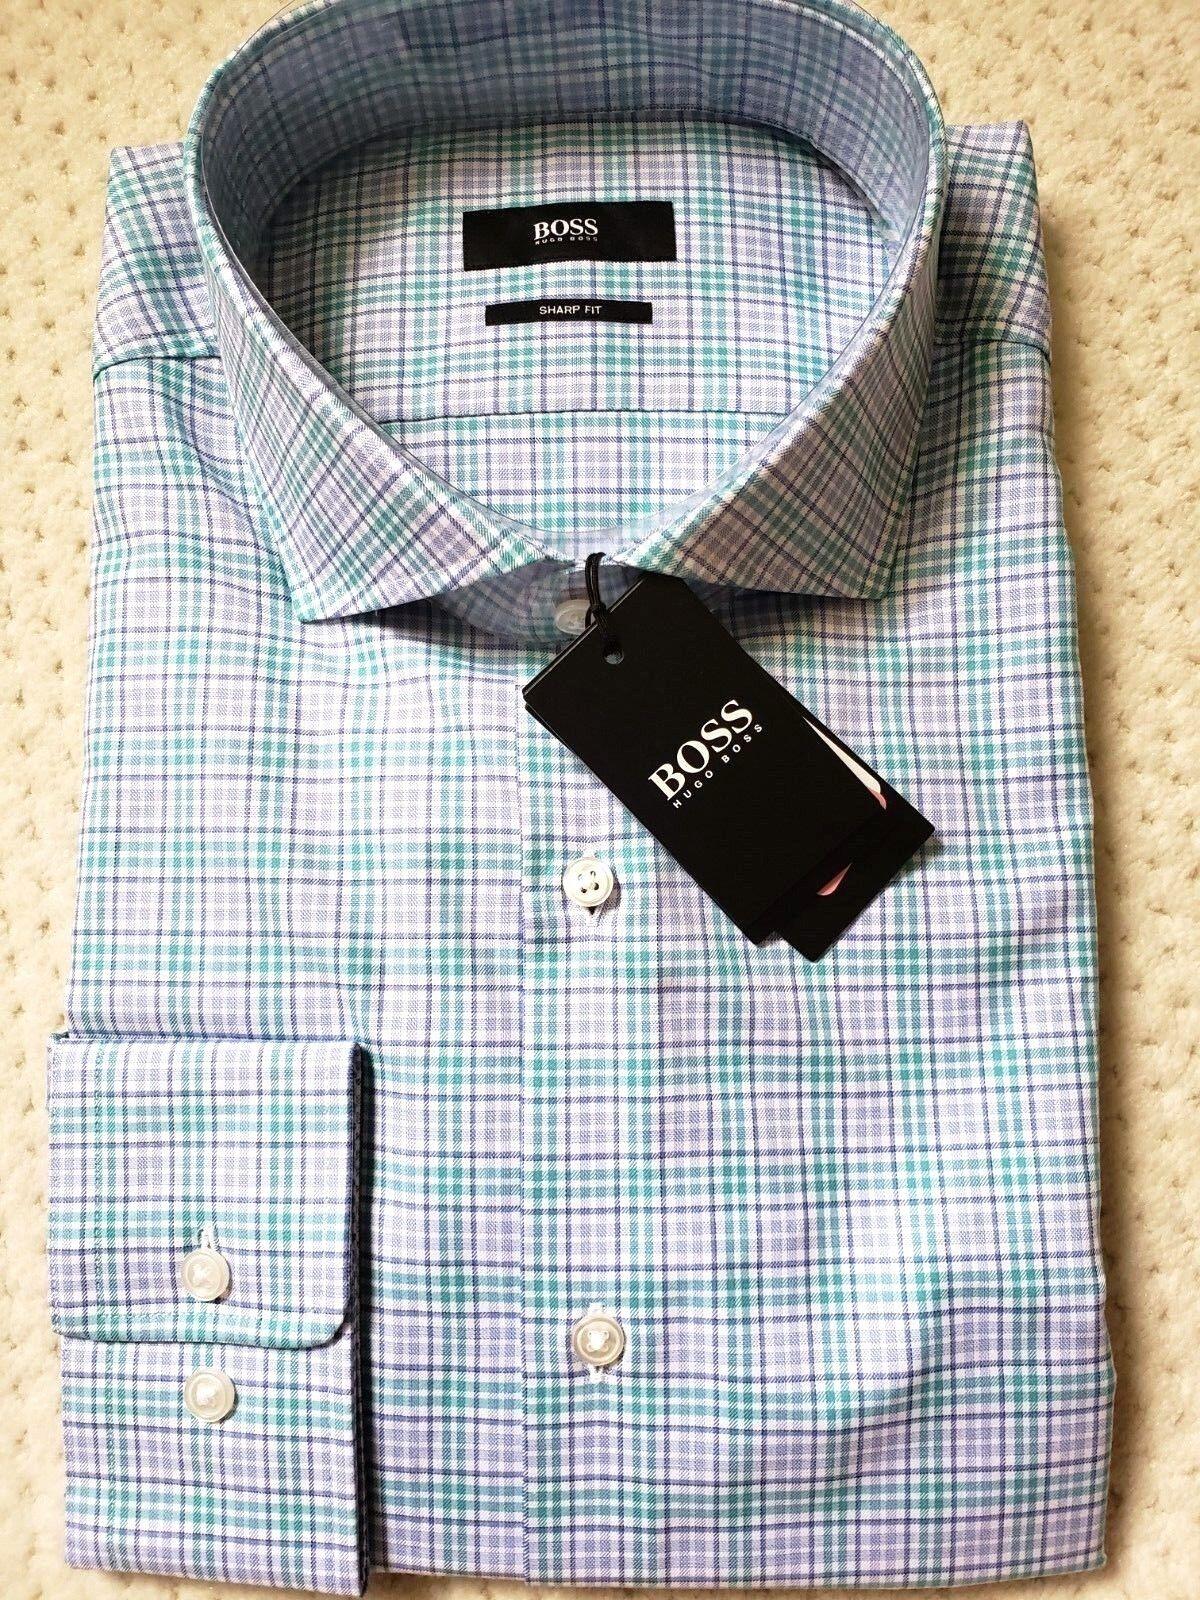 BOSS Hugo Boss Mark US Sharp Fit Spread Collar Aqua bluee Turquoise Dress Shirt